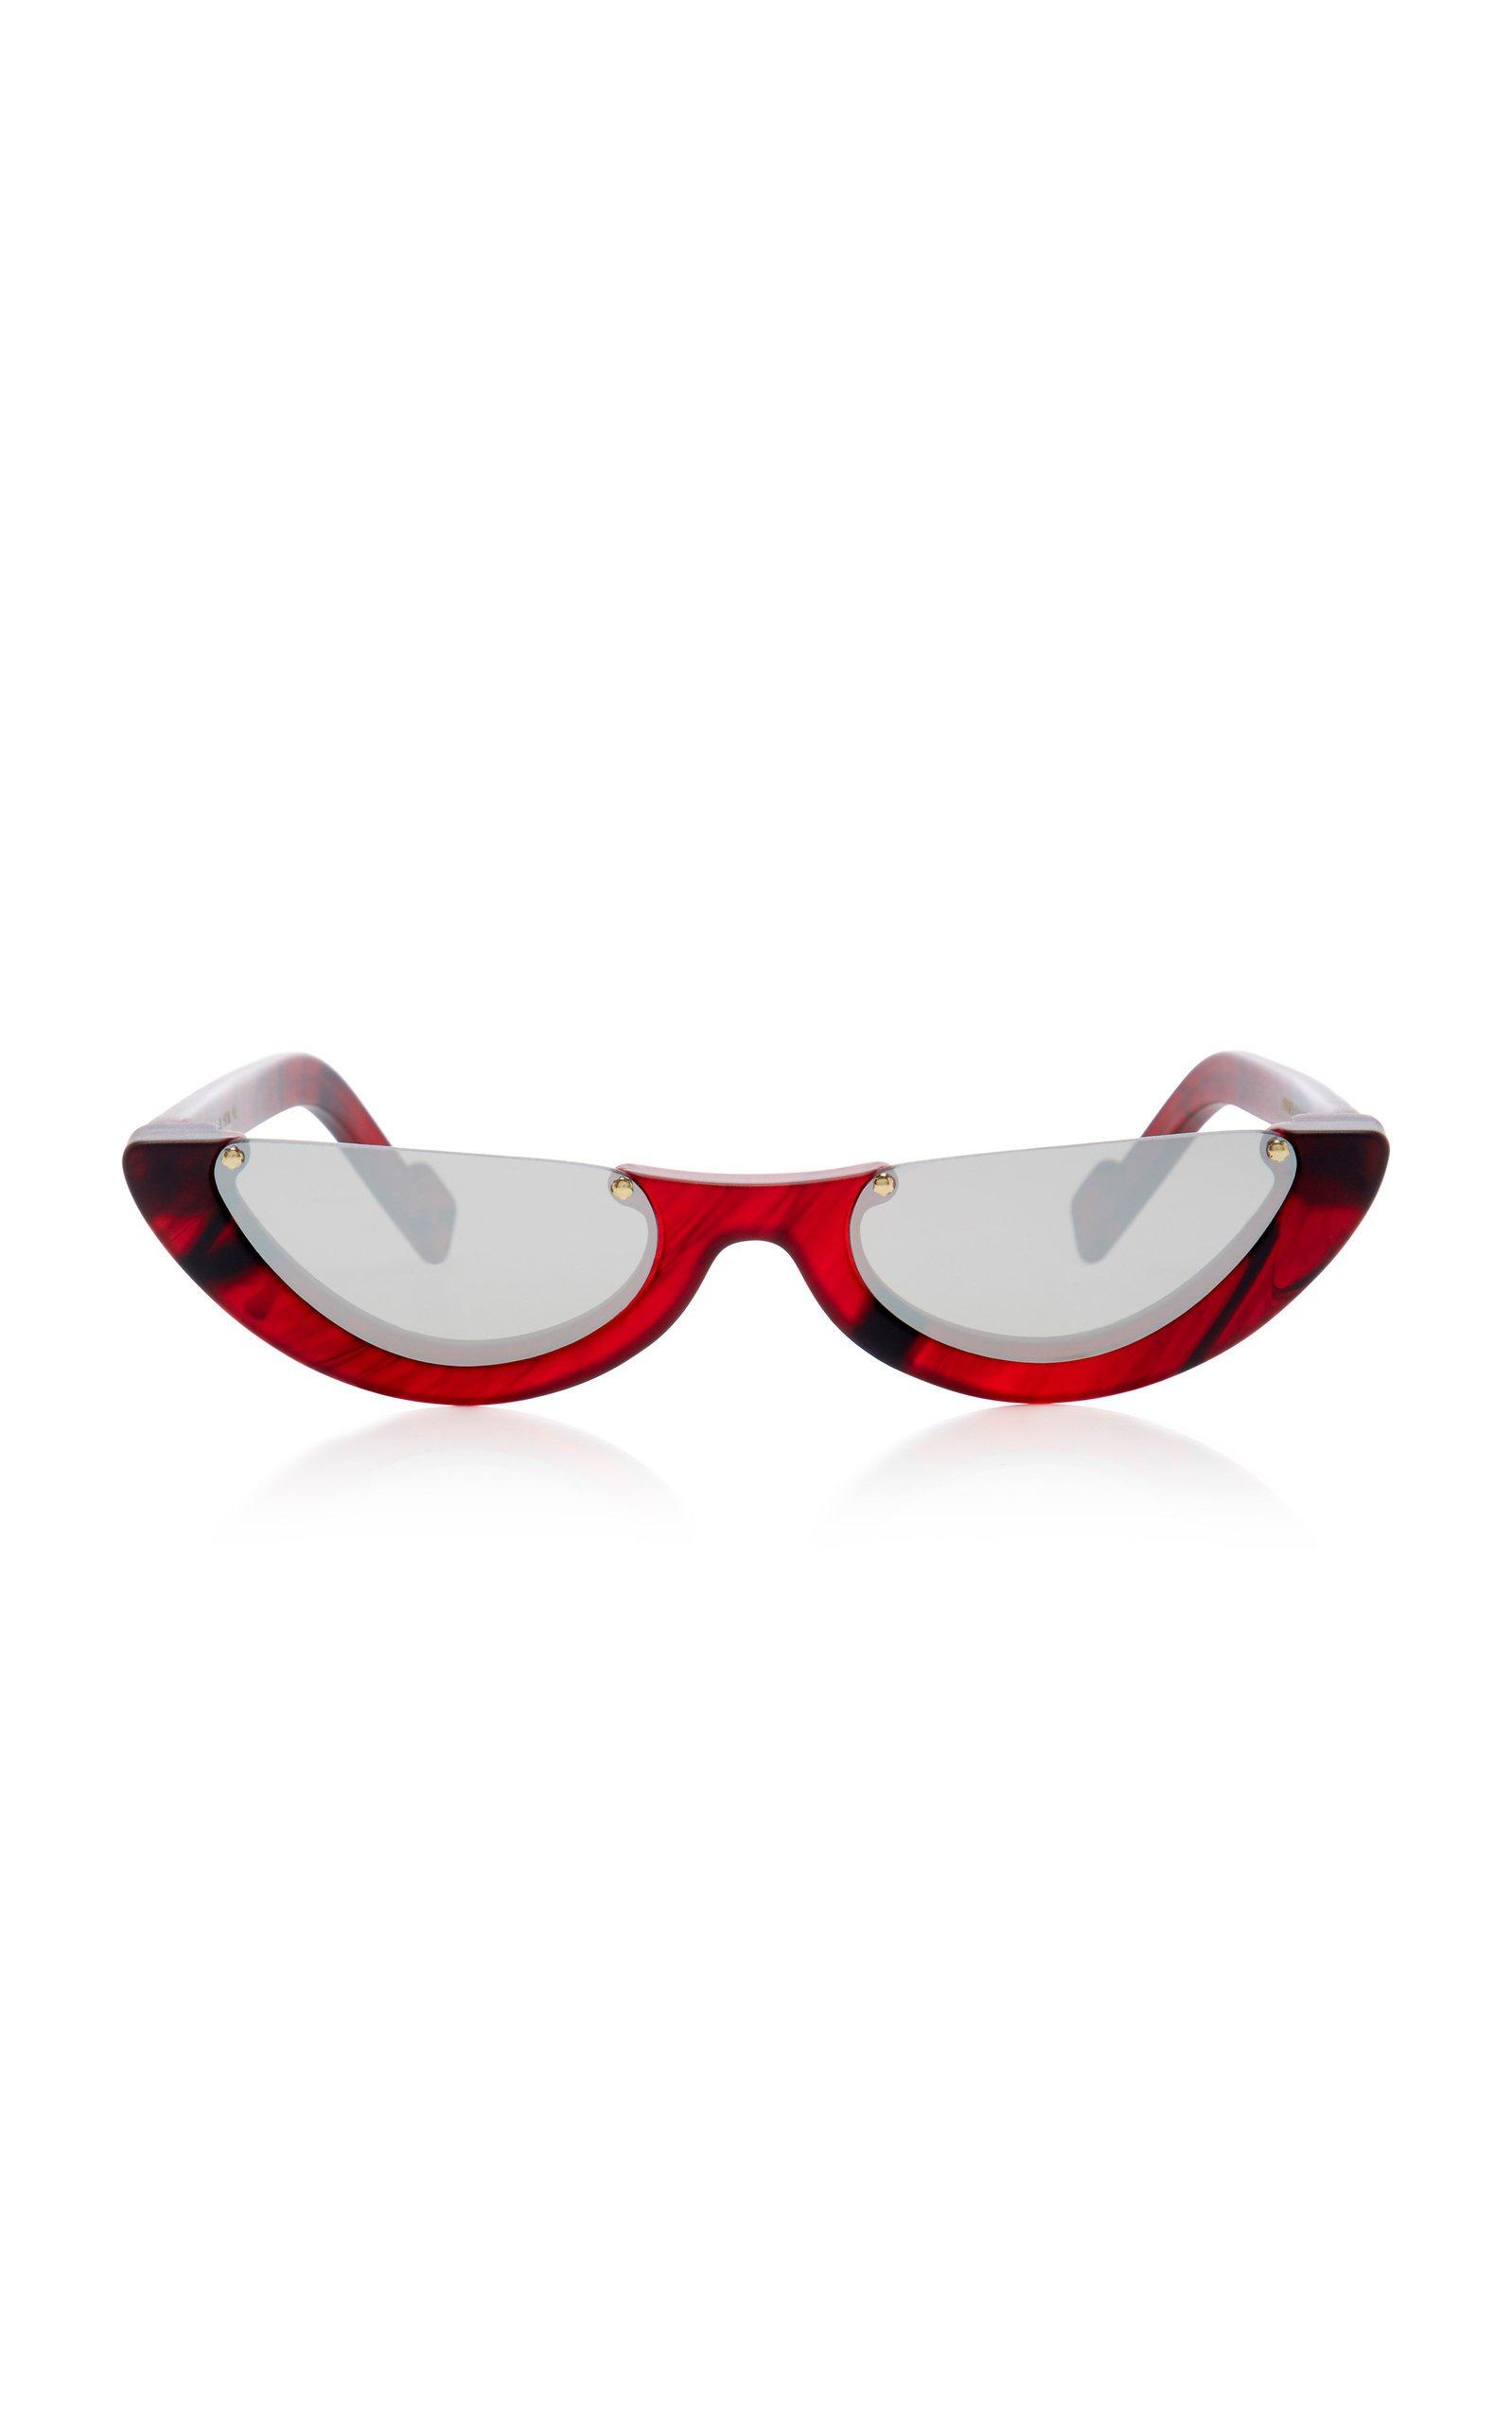 PAWAKA Empat Cat-Eye Acetate Sunglasses